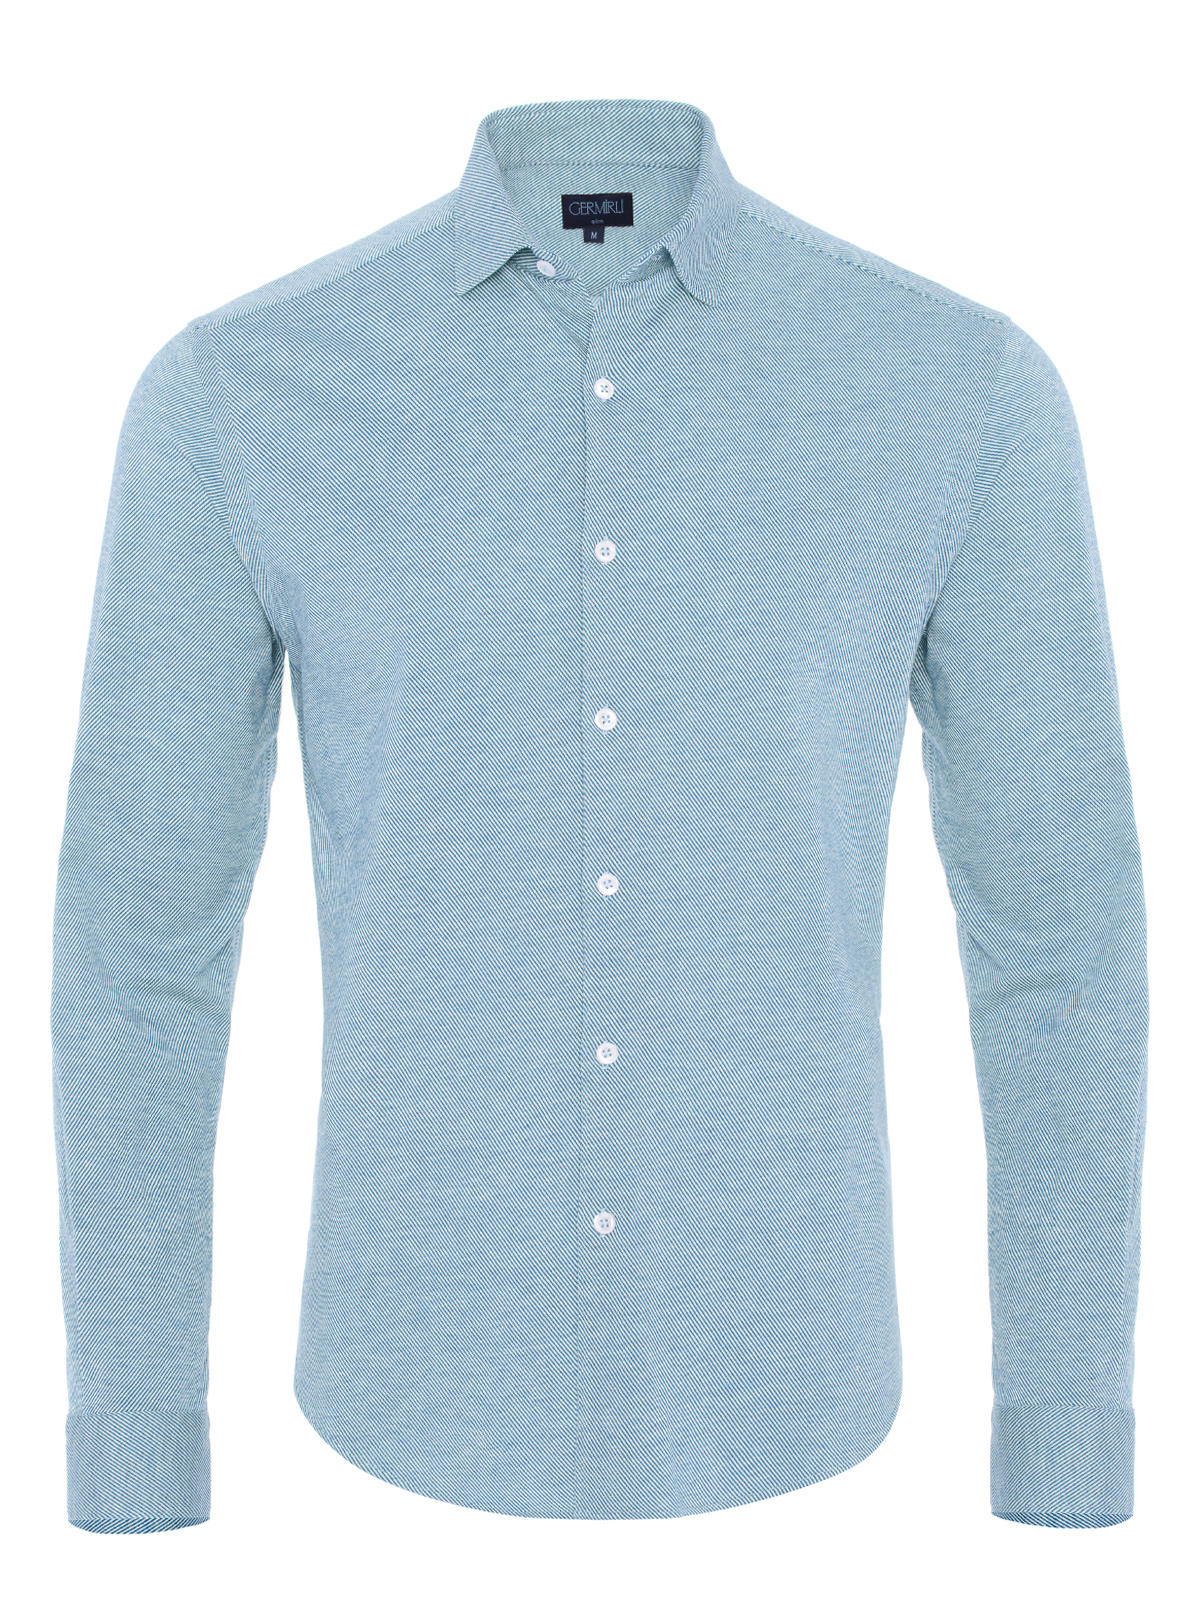 Germirli A.Mavi Twill Penye Klasik Yaka Örme Slim Fit Gömlek